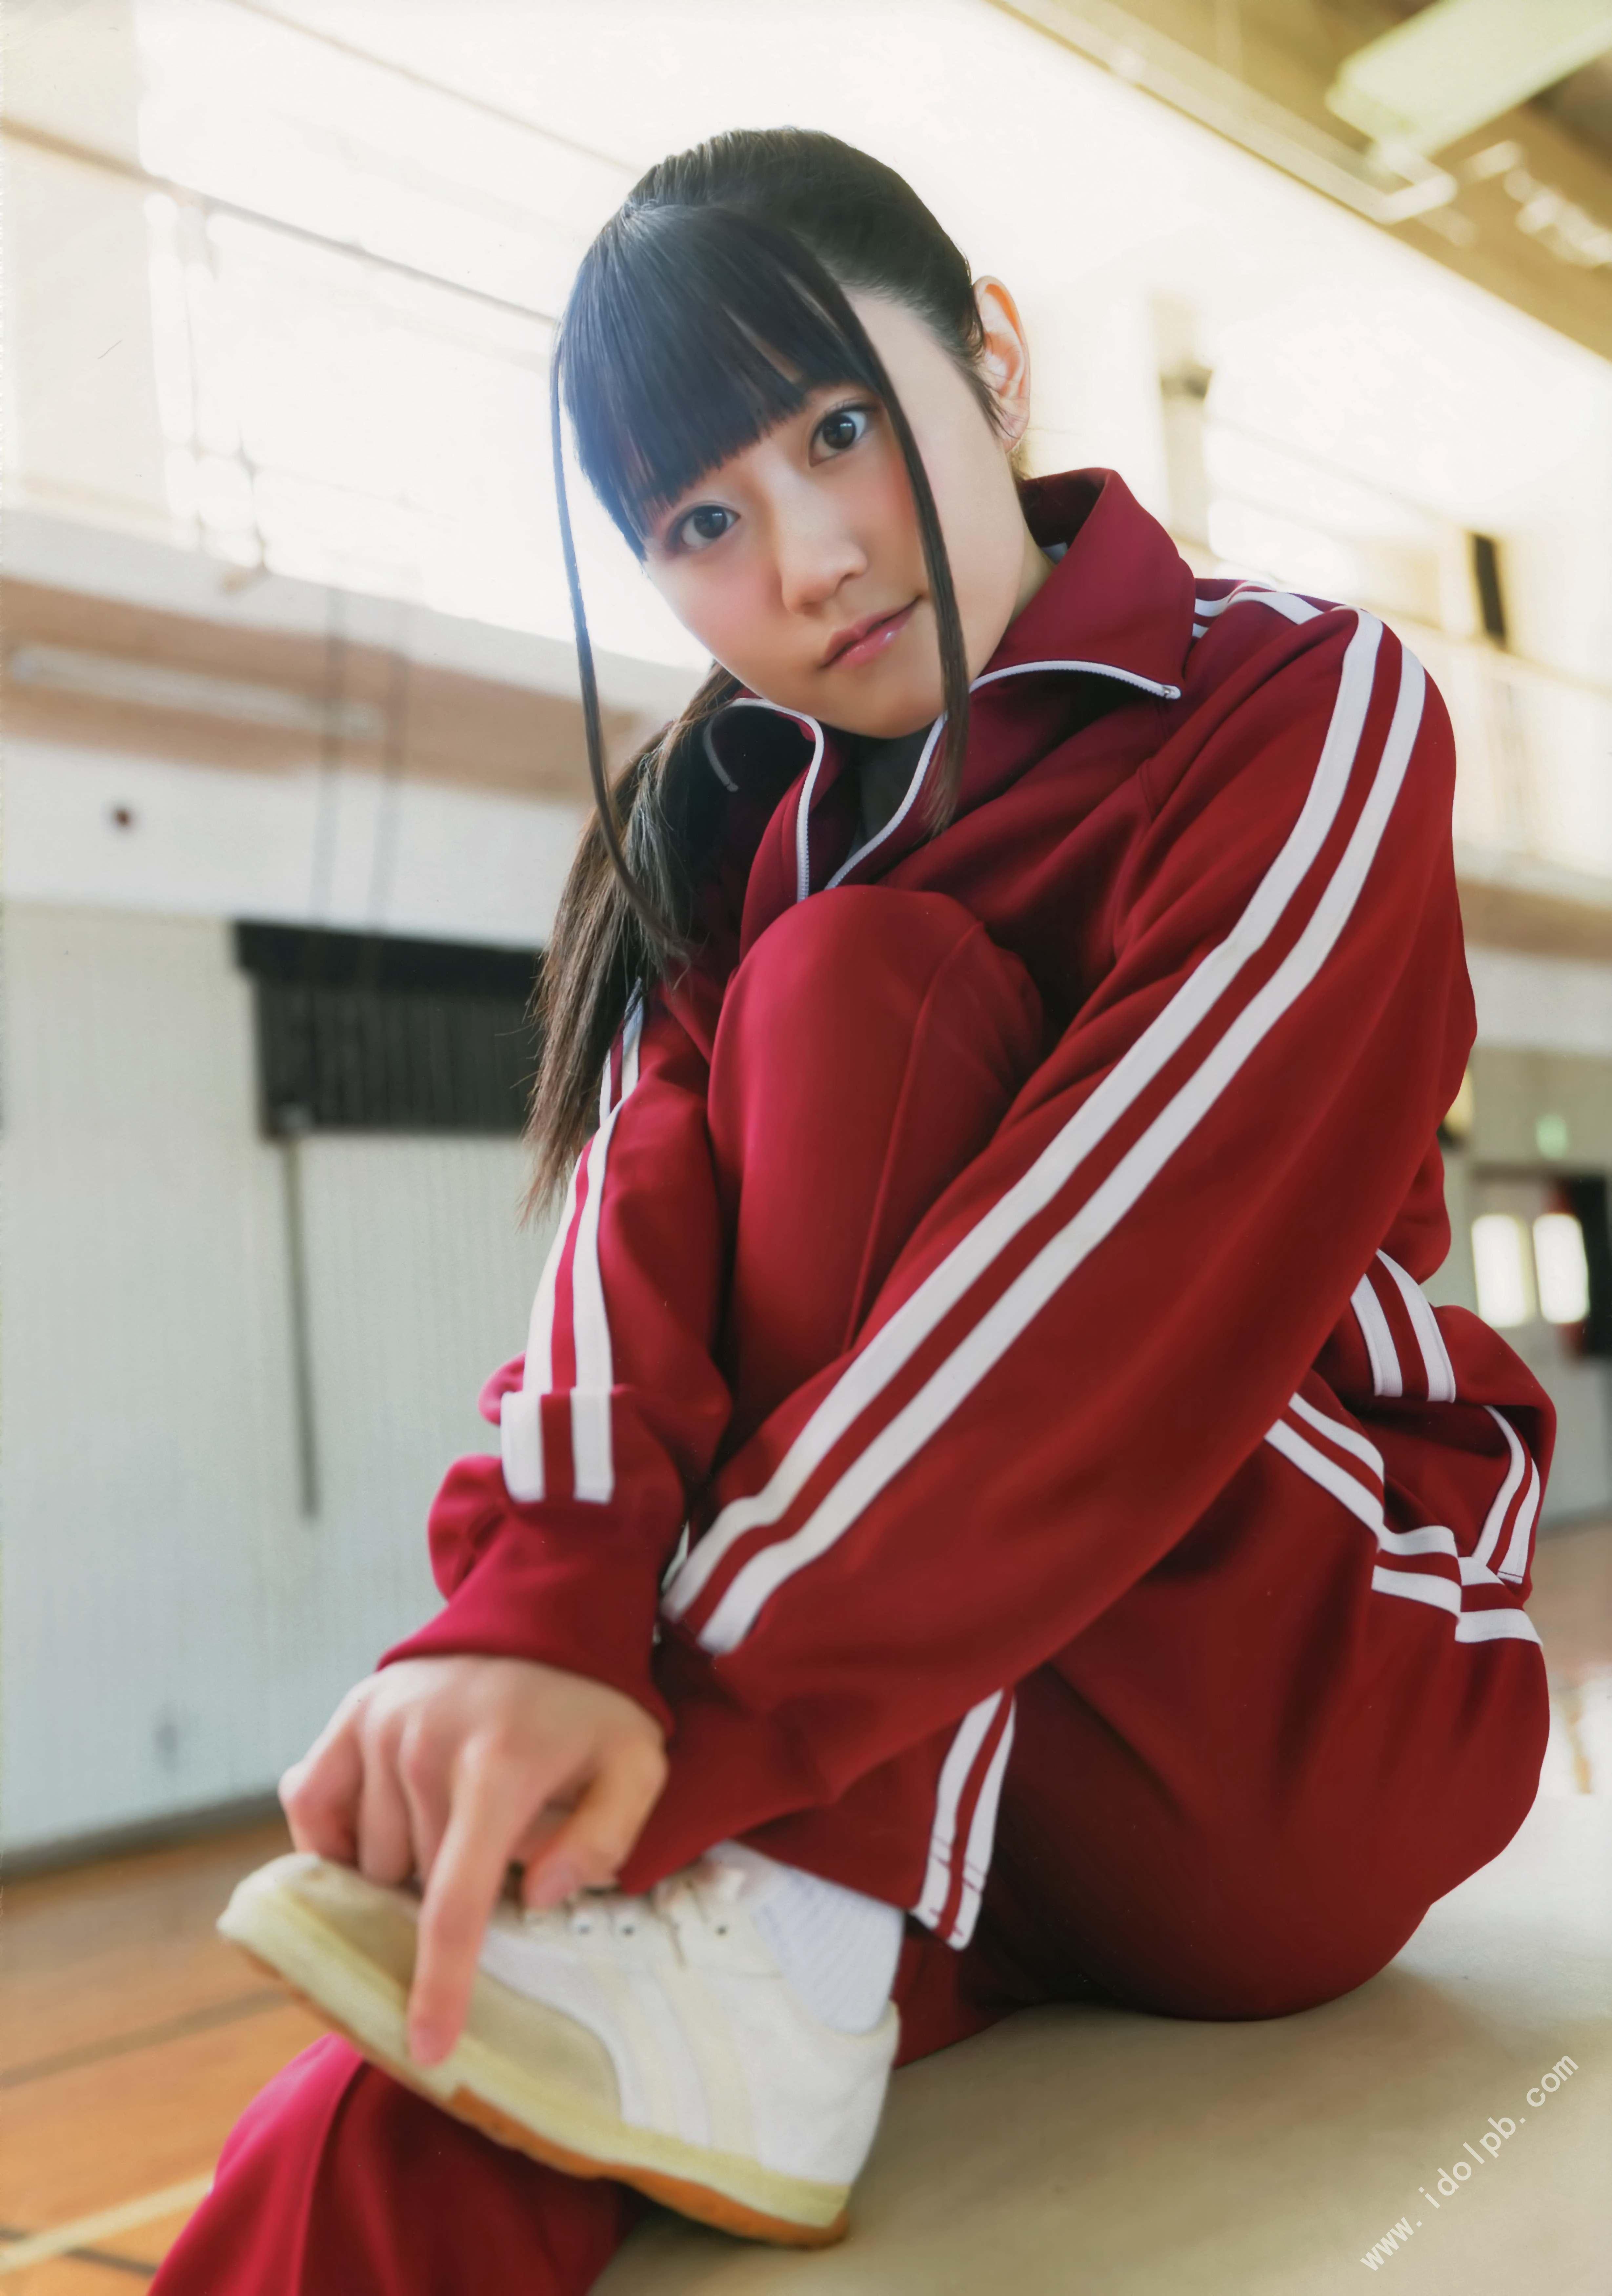 ogura_yui141.jpg